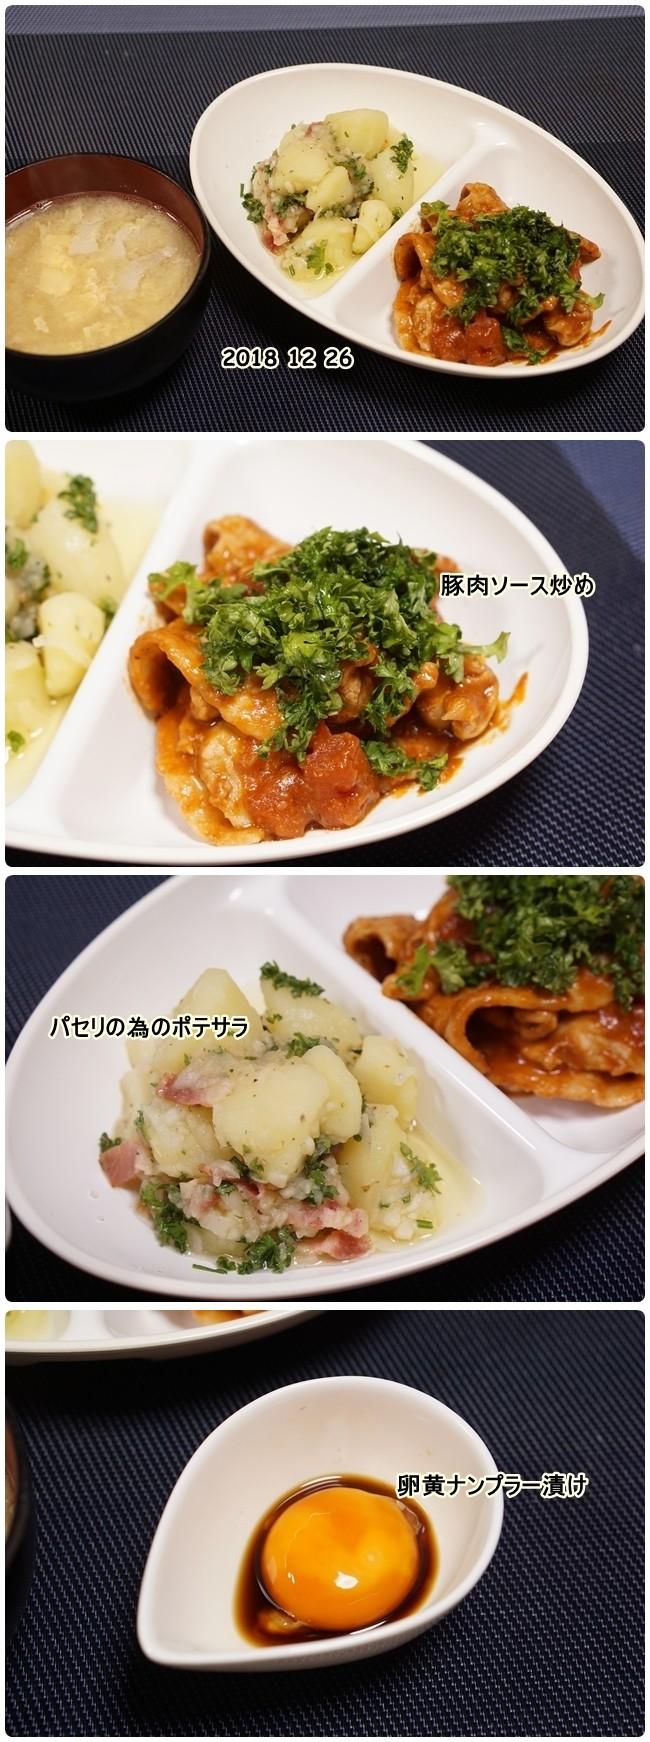 ■DSC01808-vert